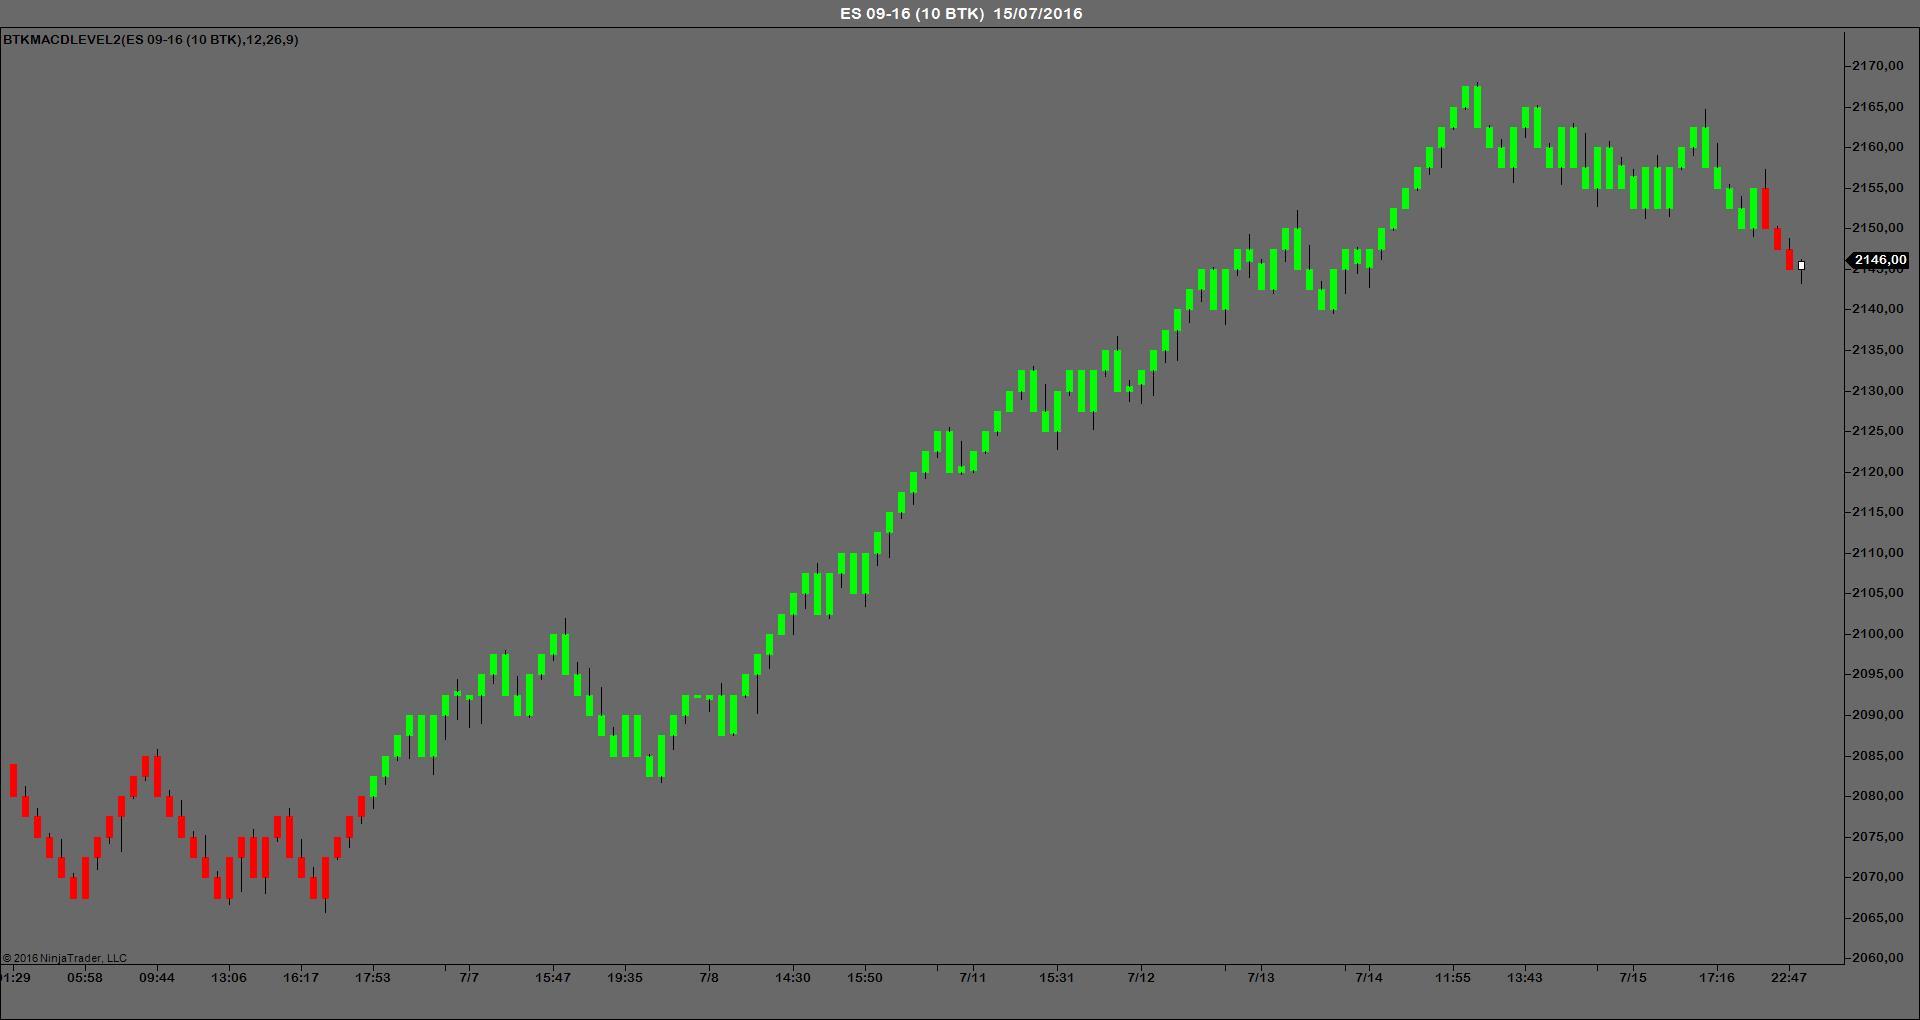 BTKMACDLEVEL2 indicador trading